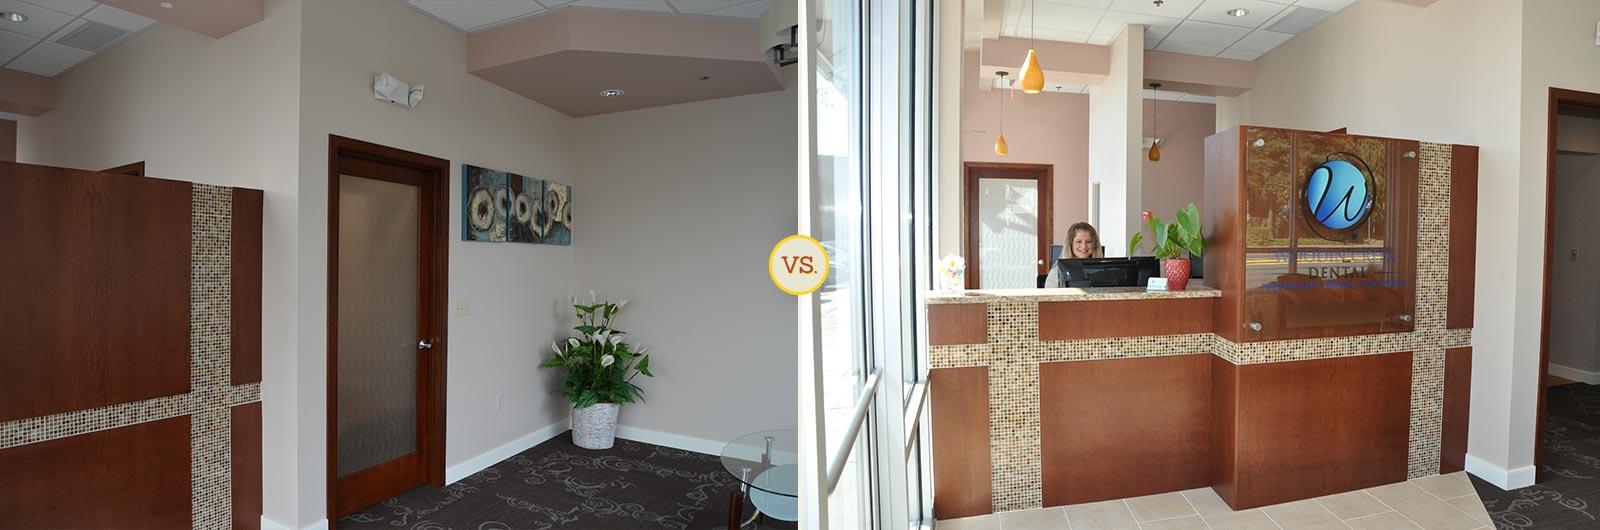 Side-by-side comparison of dental practice front desk photos